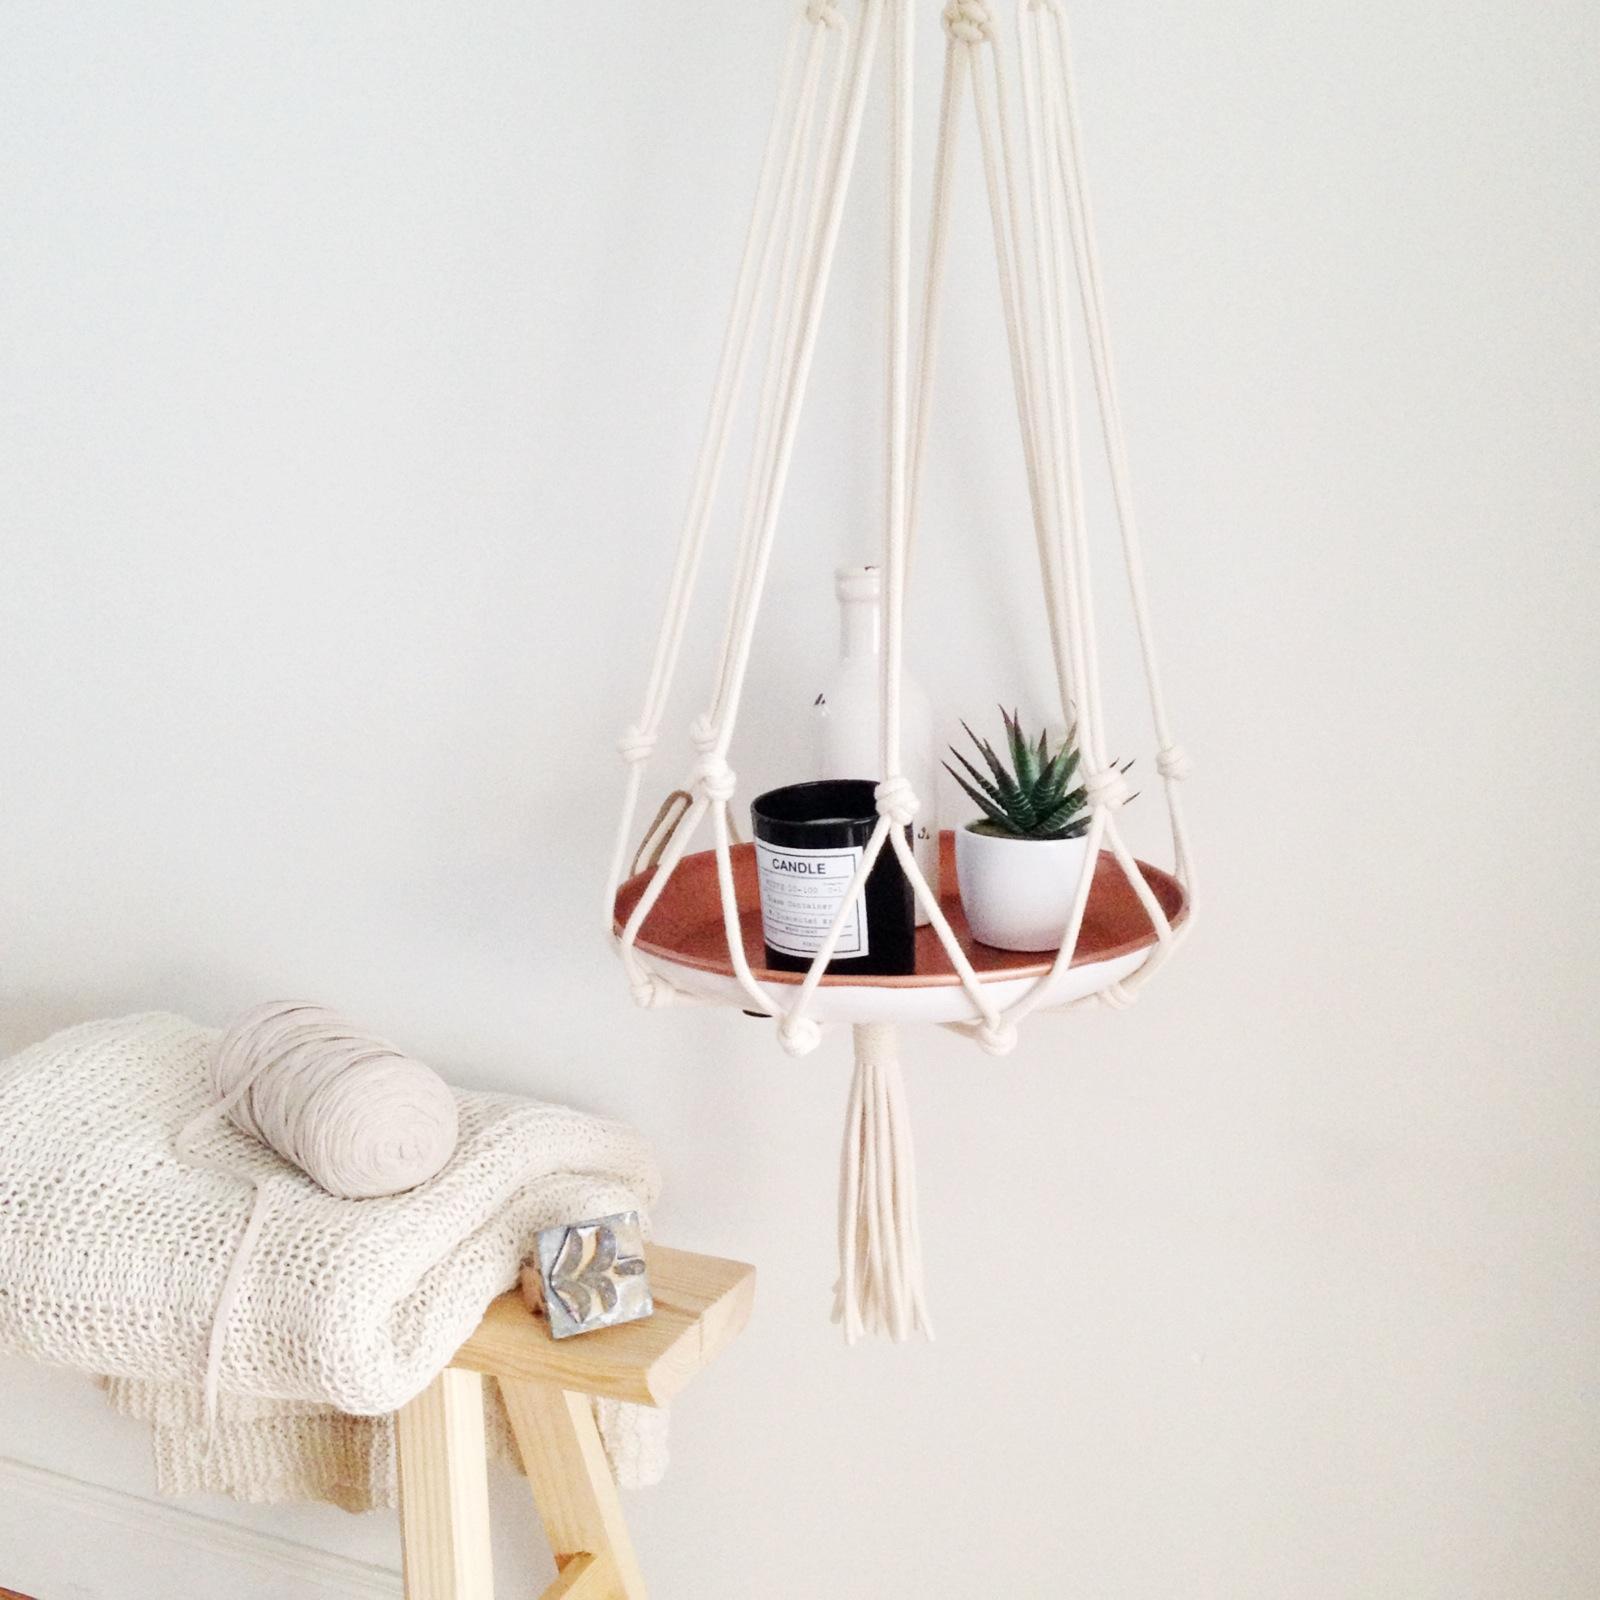 selinesteba.com - Snoeps hanger met koperen dienblad